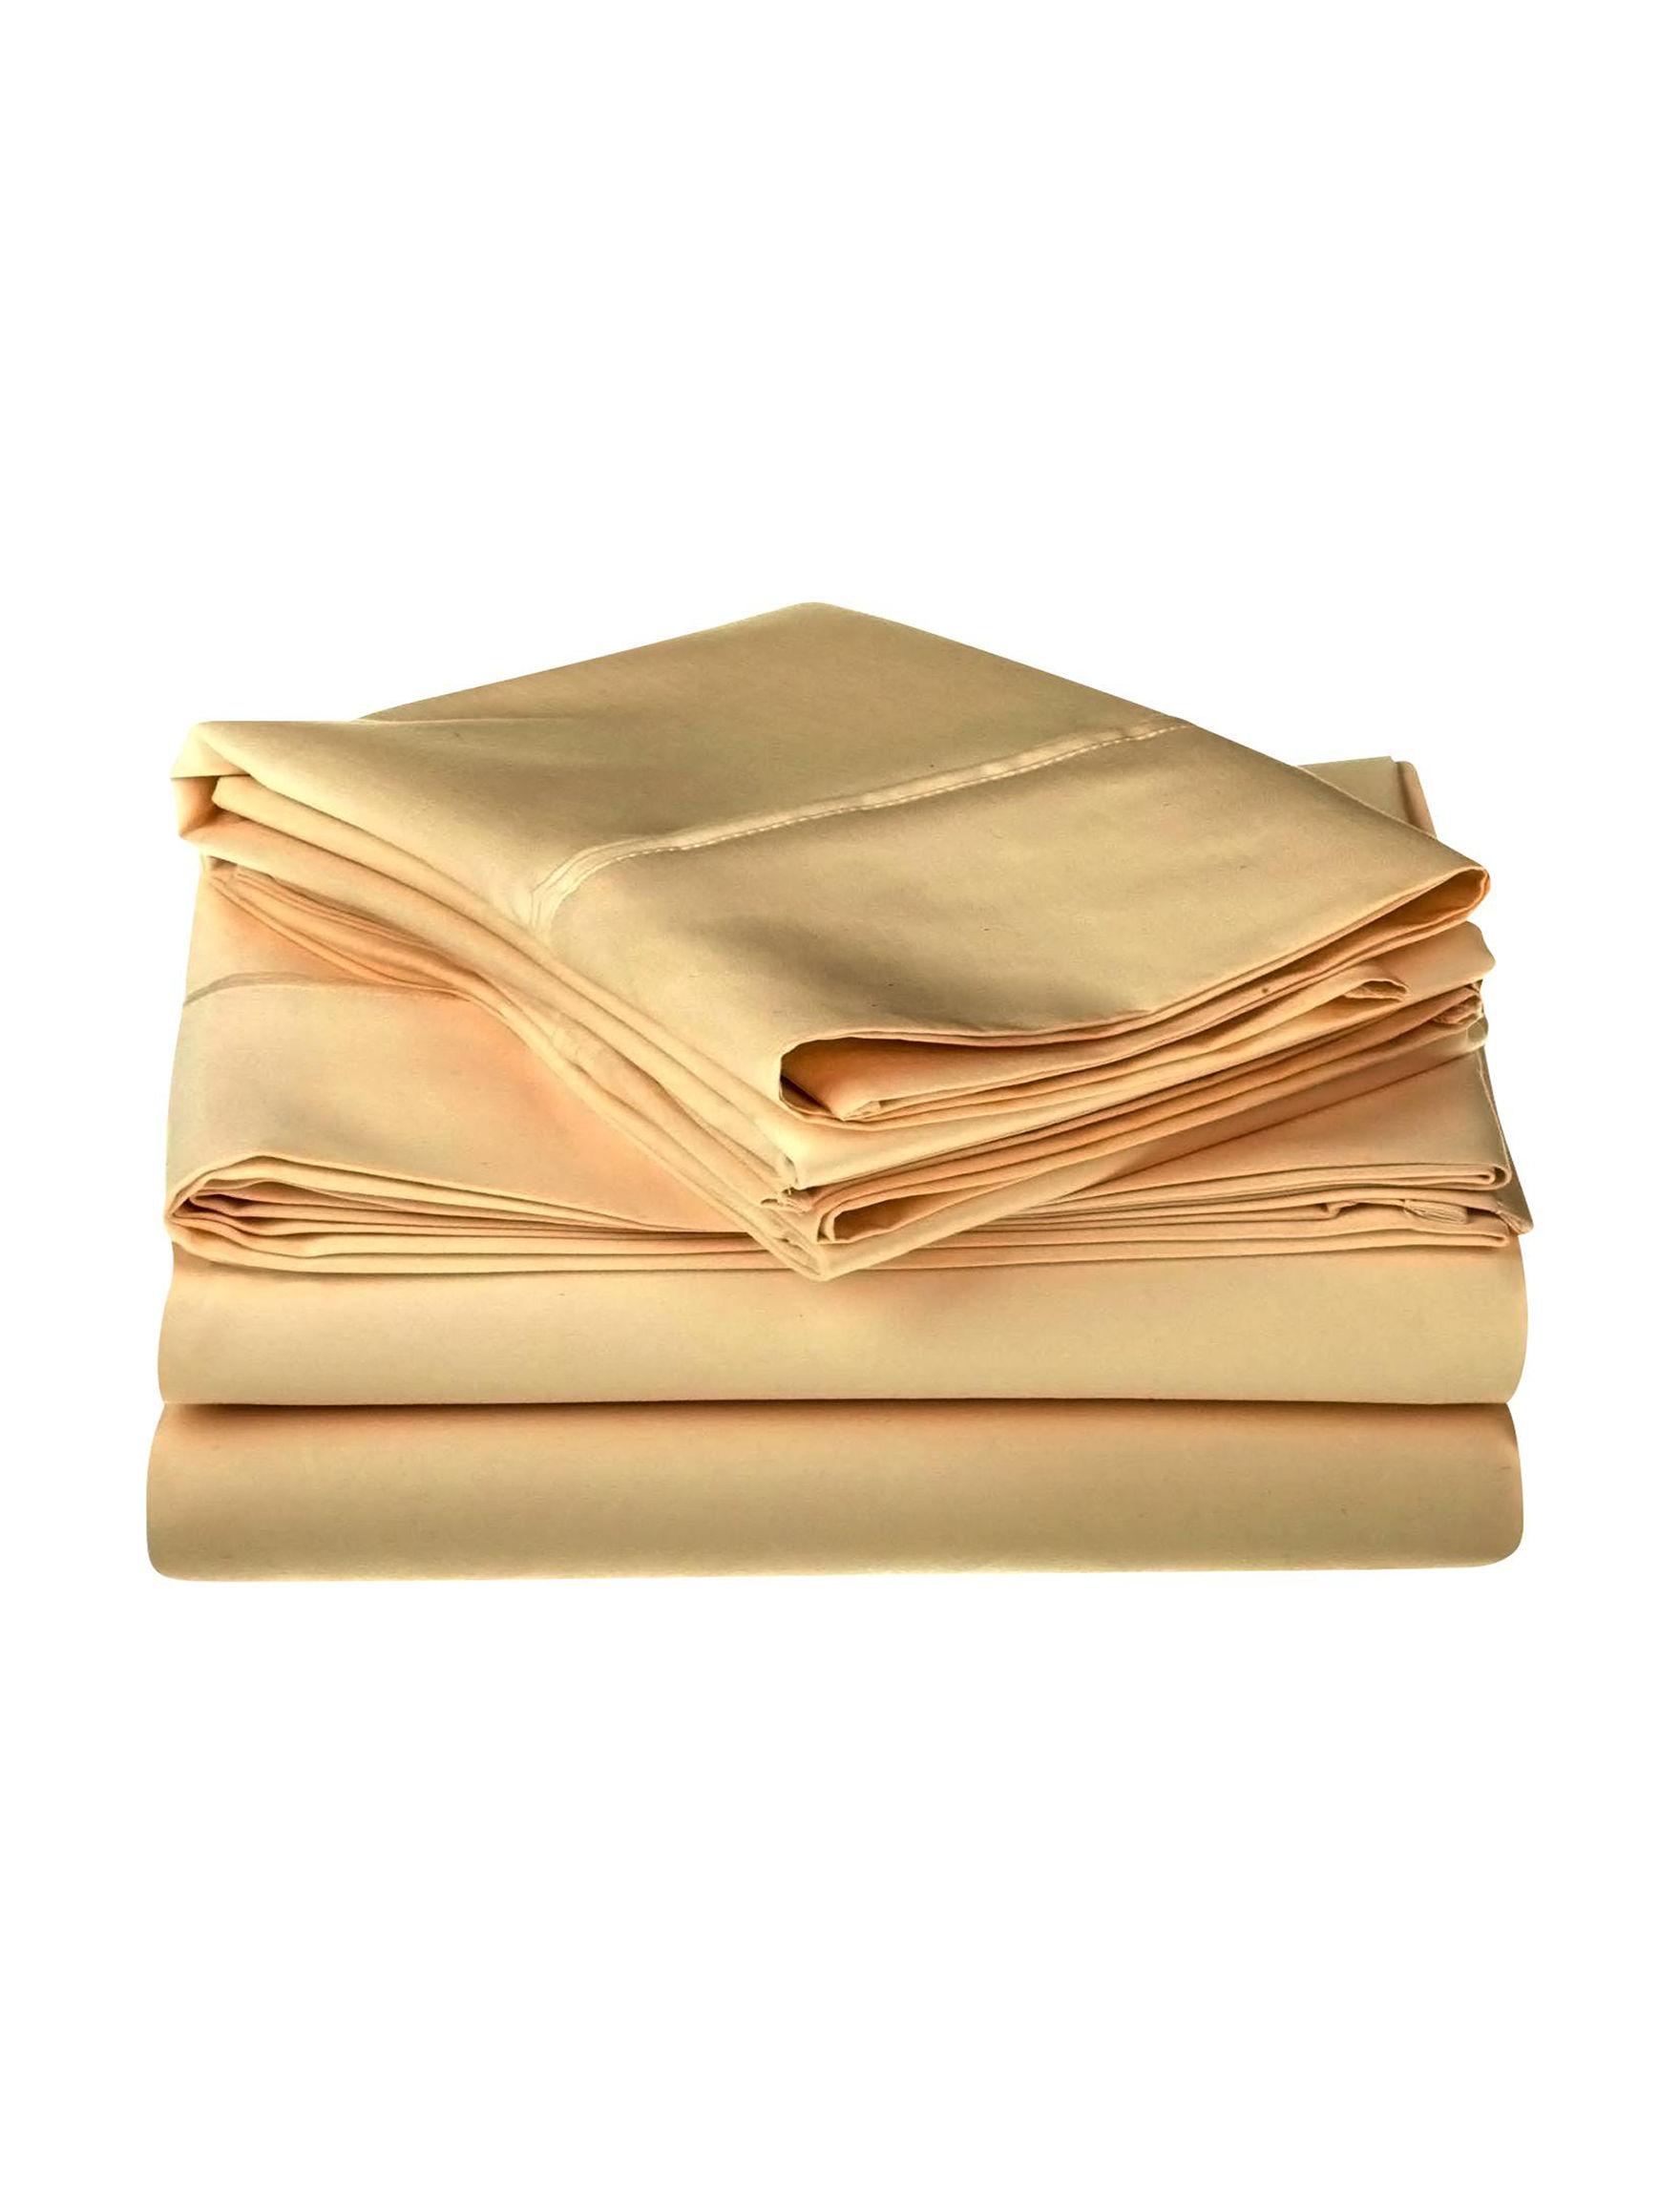 Superior Gold Sheets & Pillowcases